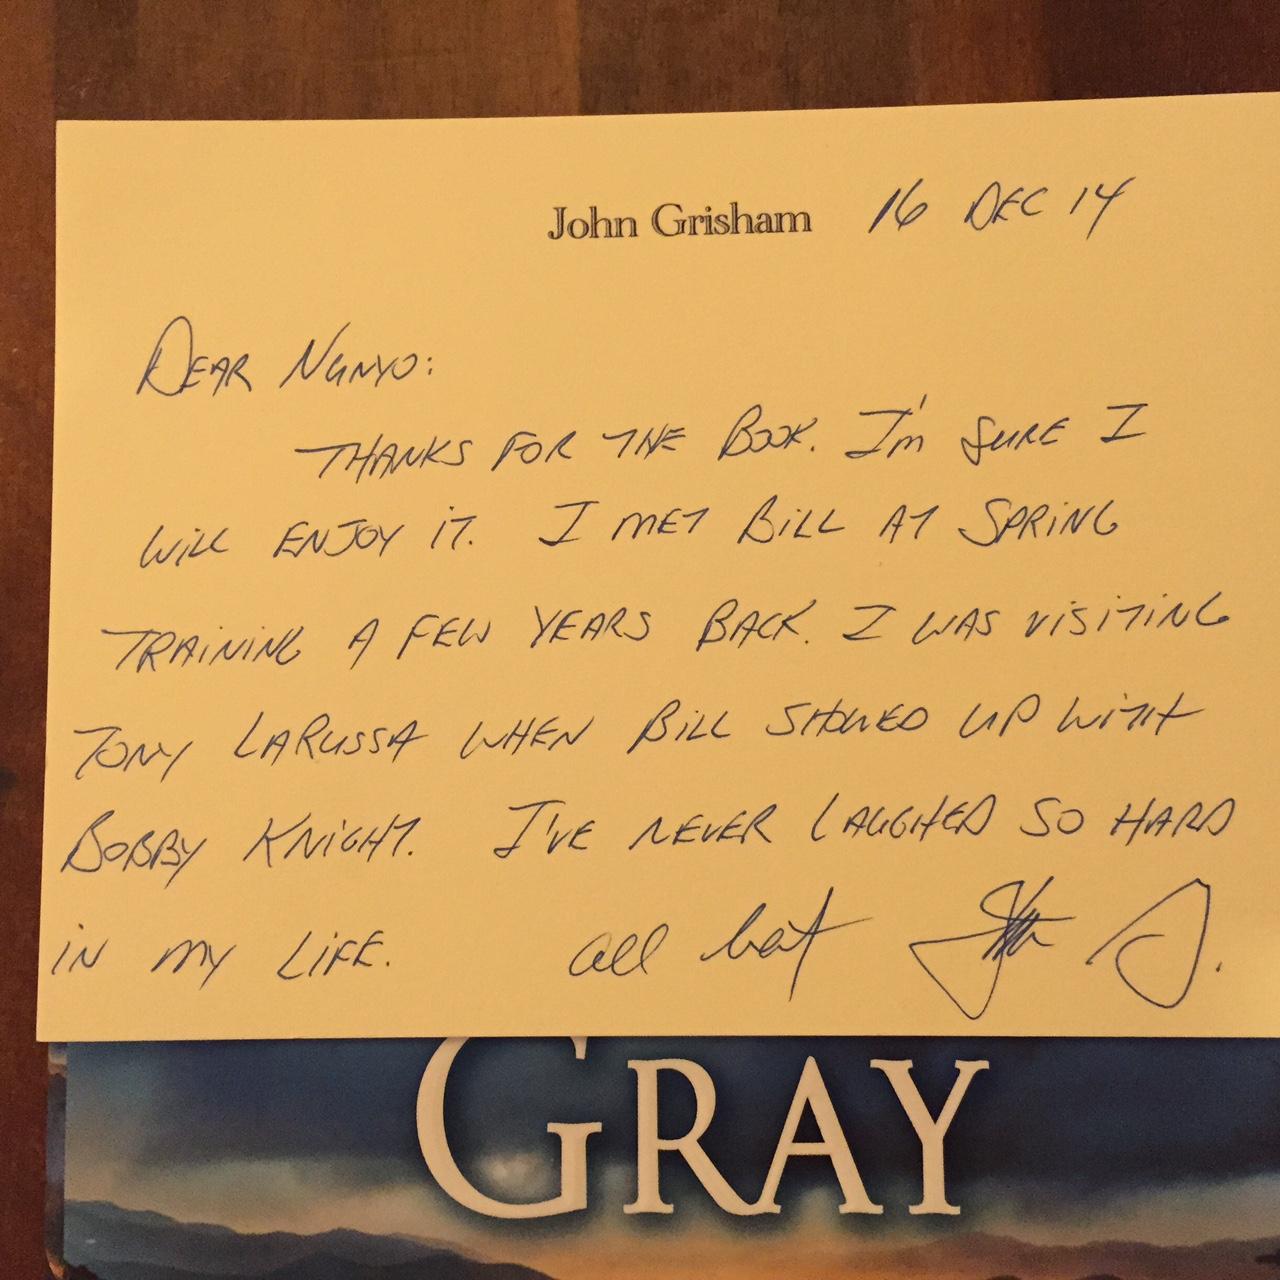 grisham note copy.jpeg